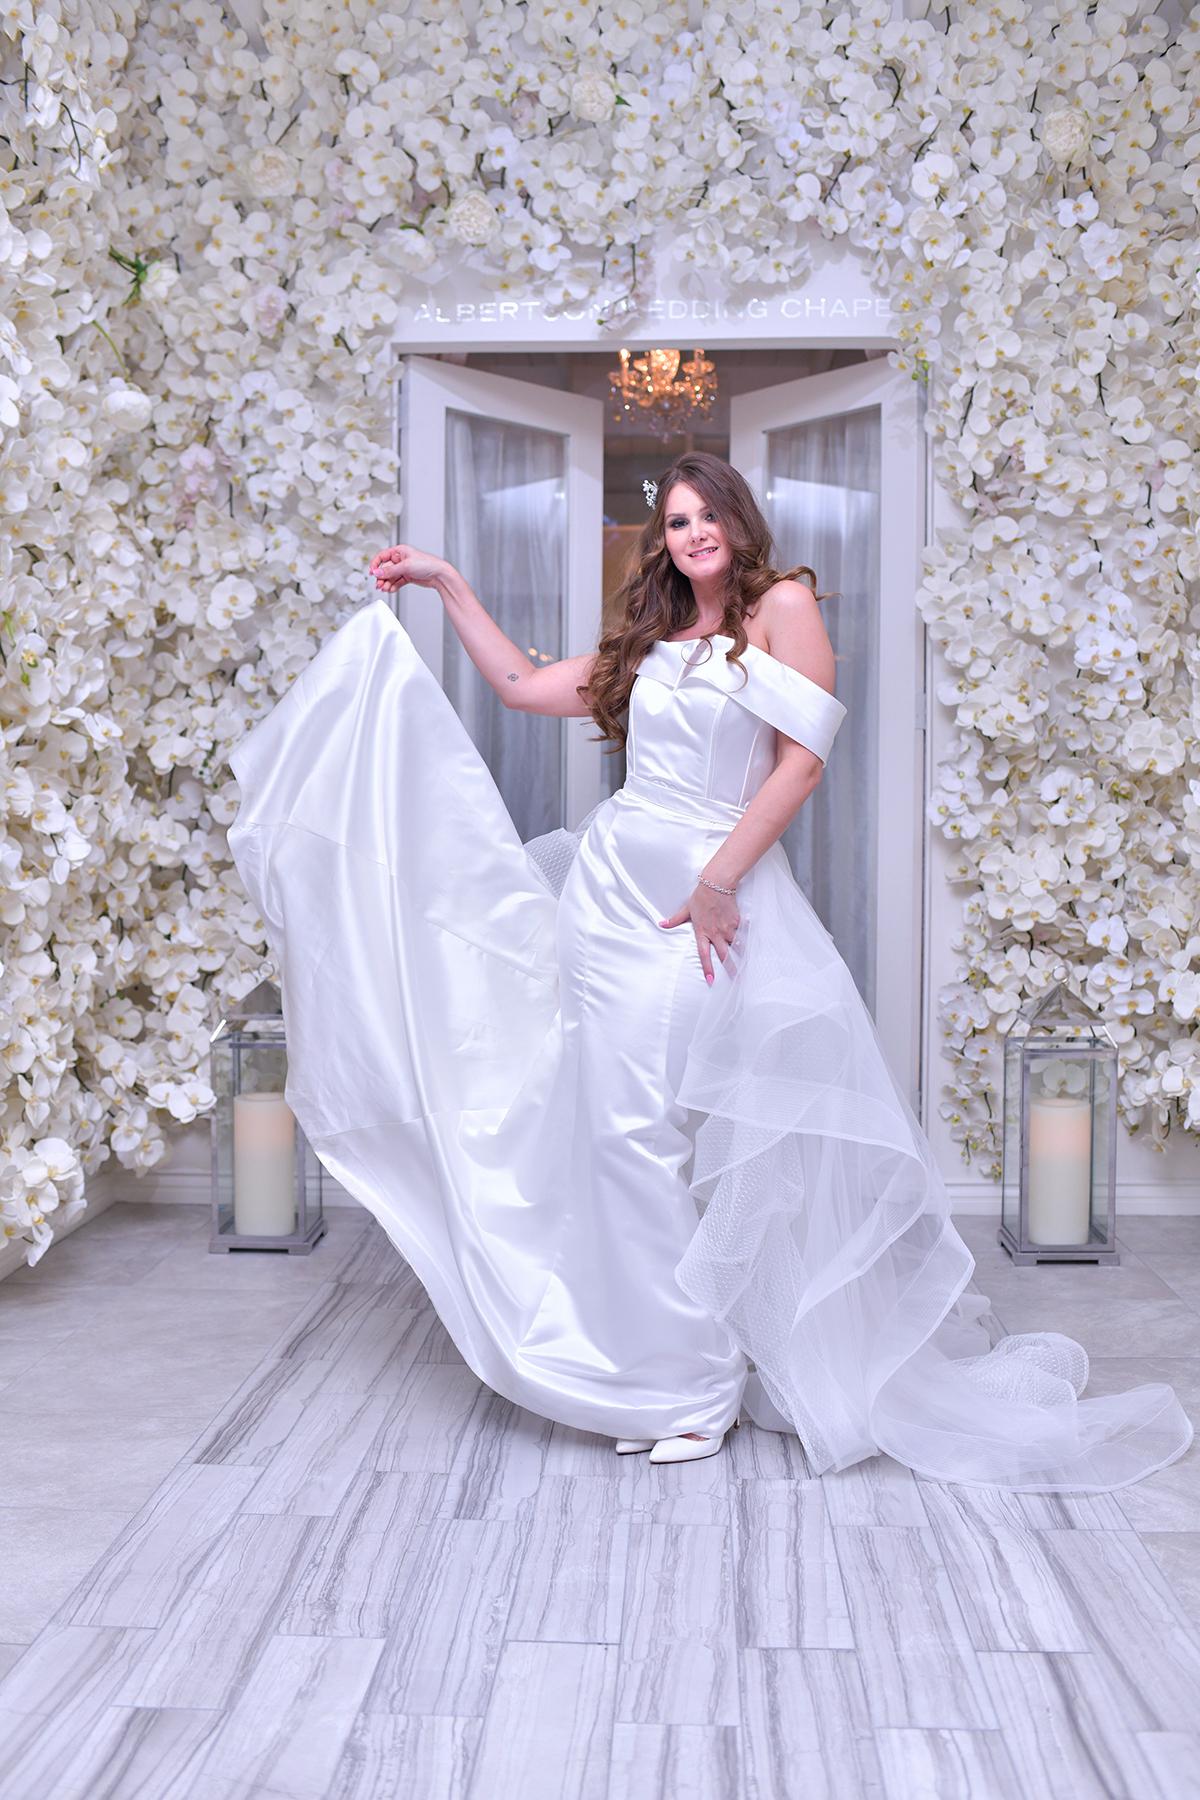 albertson wedding chapel civil ceremony and prices